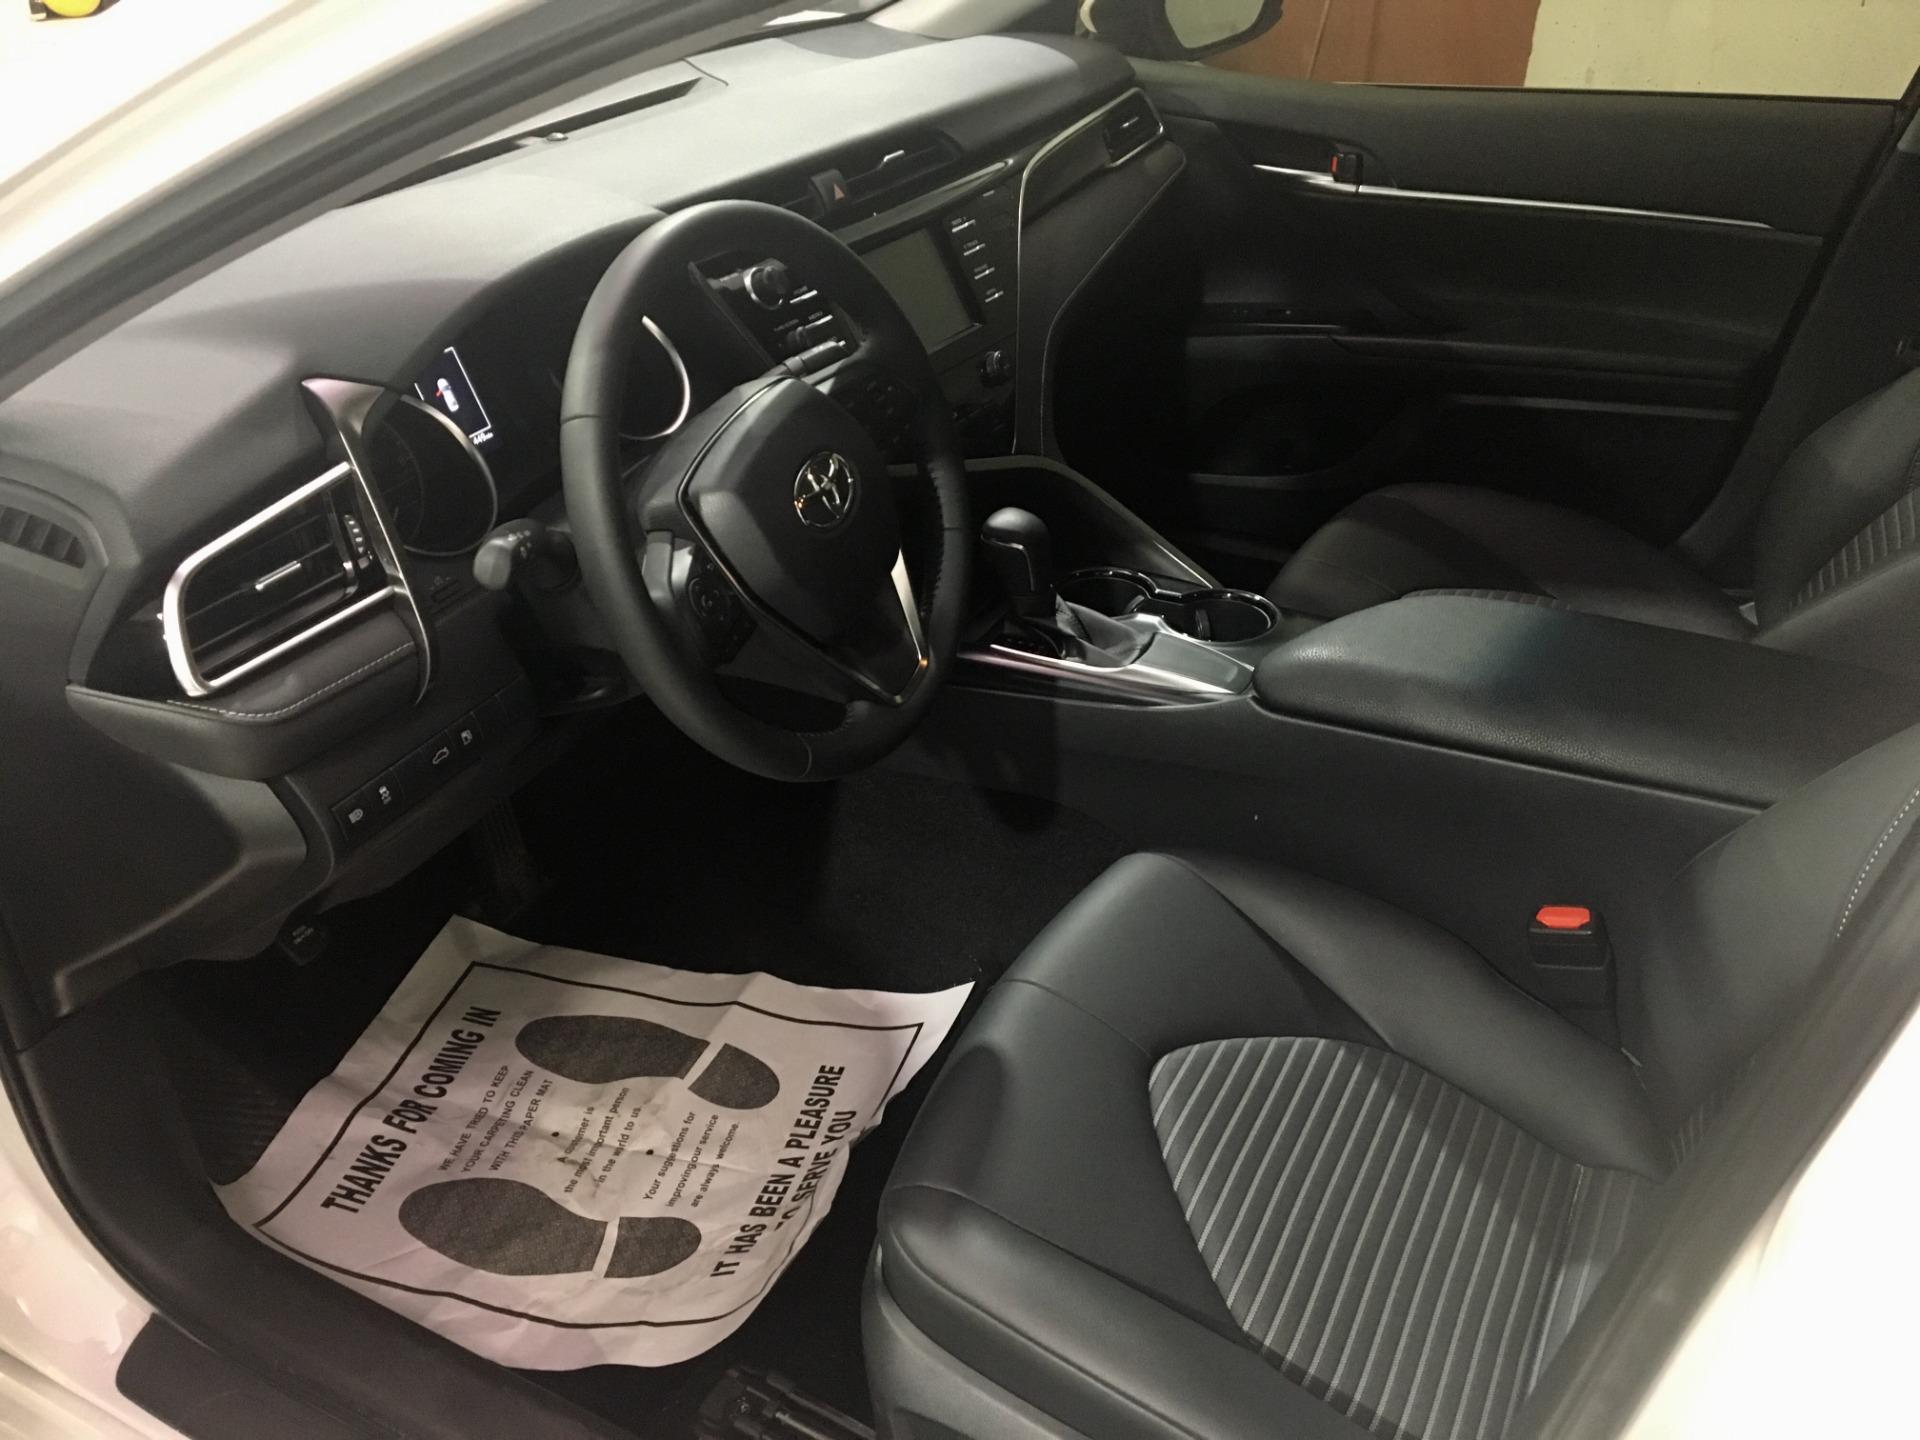 2018 Toyota Camry SE 4dr Sedan Stock # 24167 for sale near